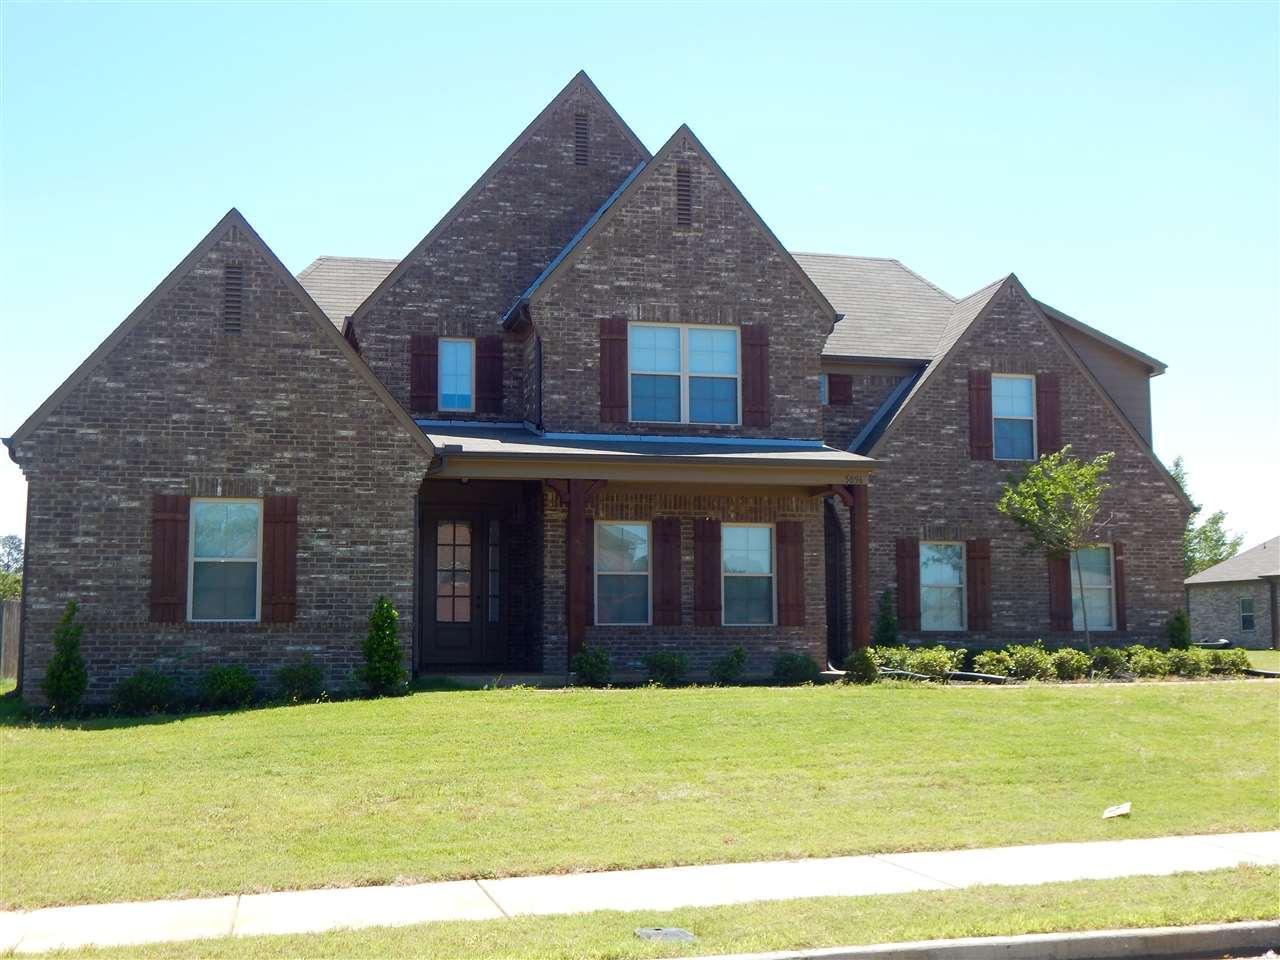 6108 Piney Bluff Dr, Bartlett, TN — MLS 10002751 — Coldwell Banker